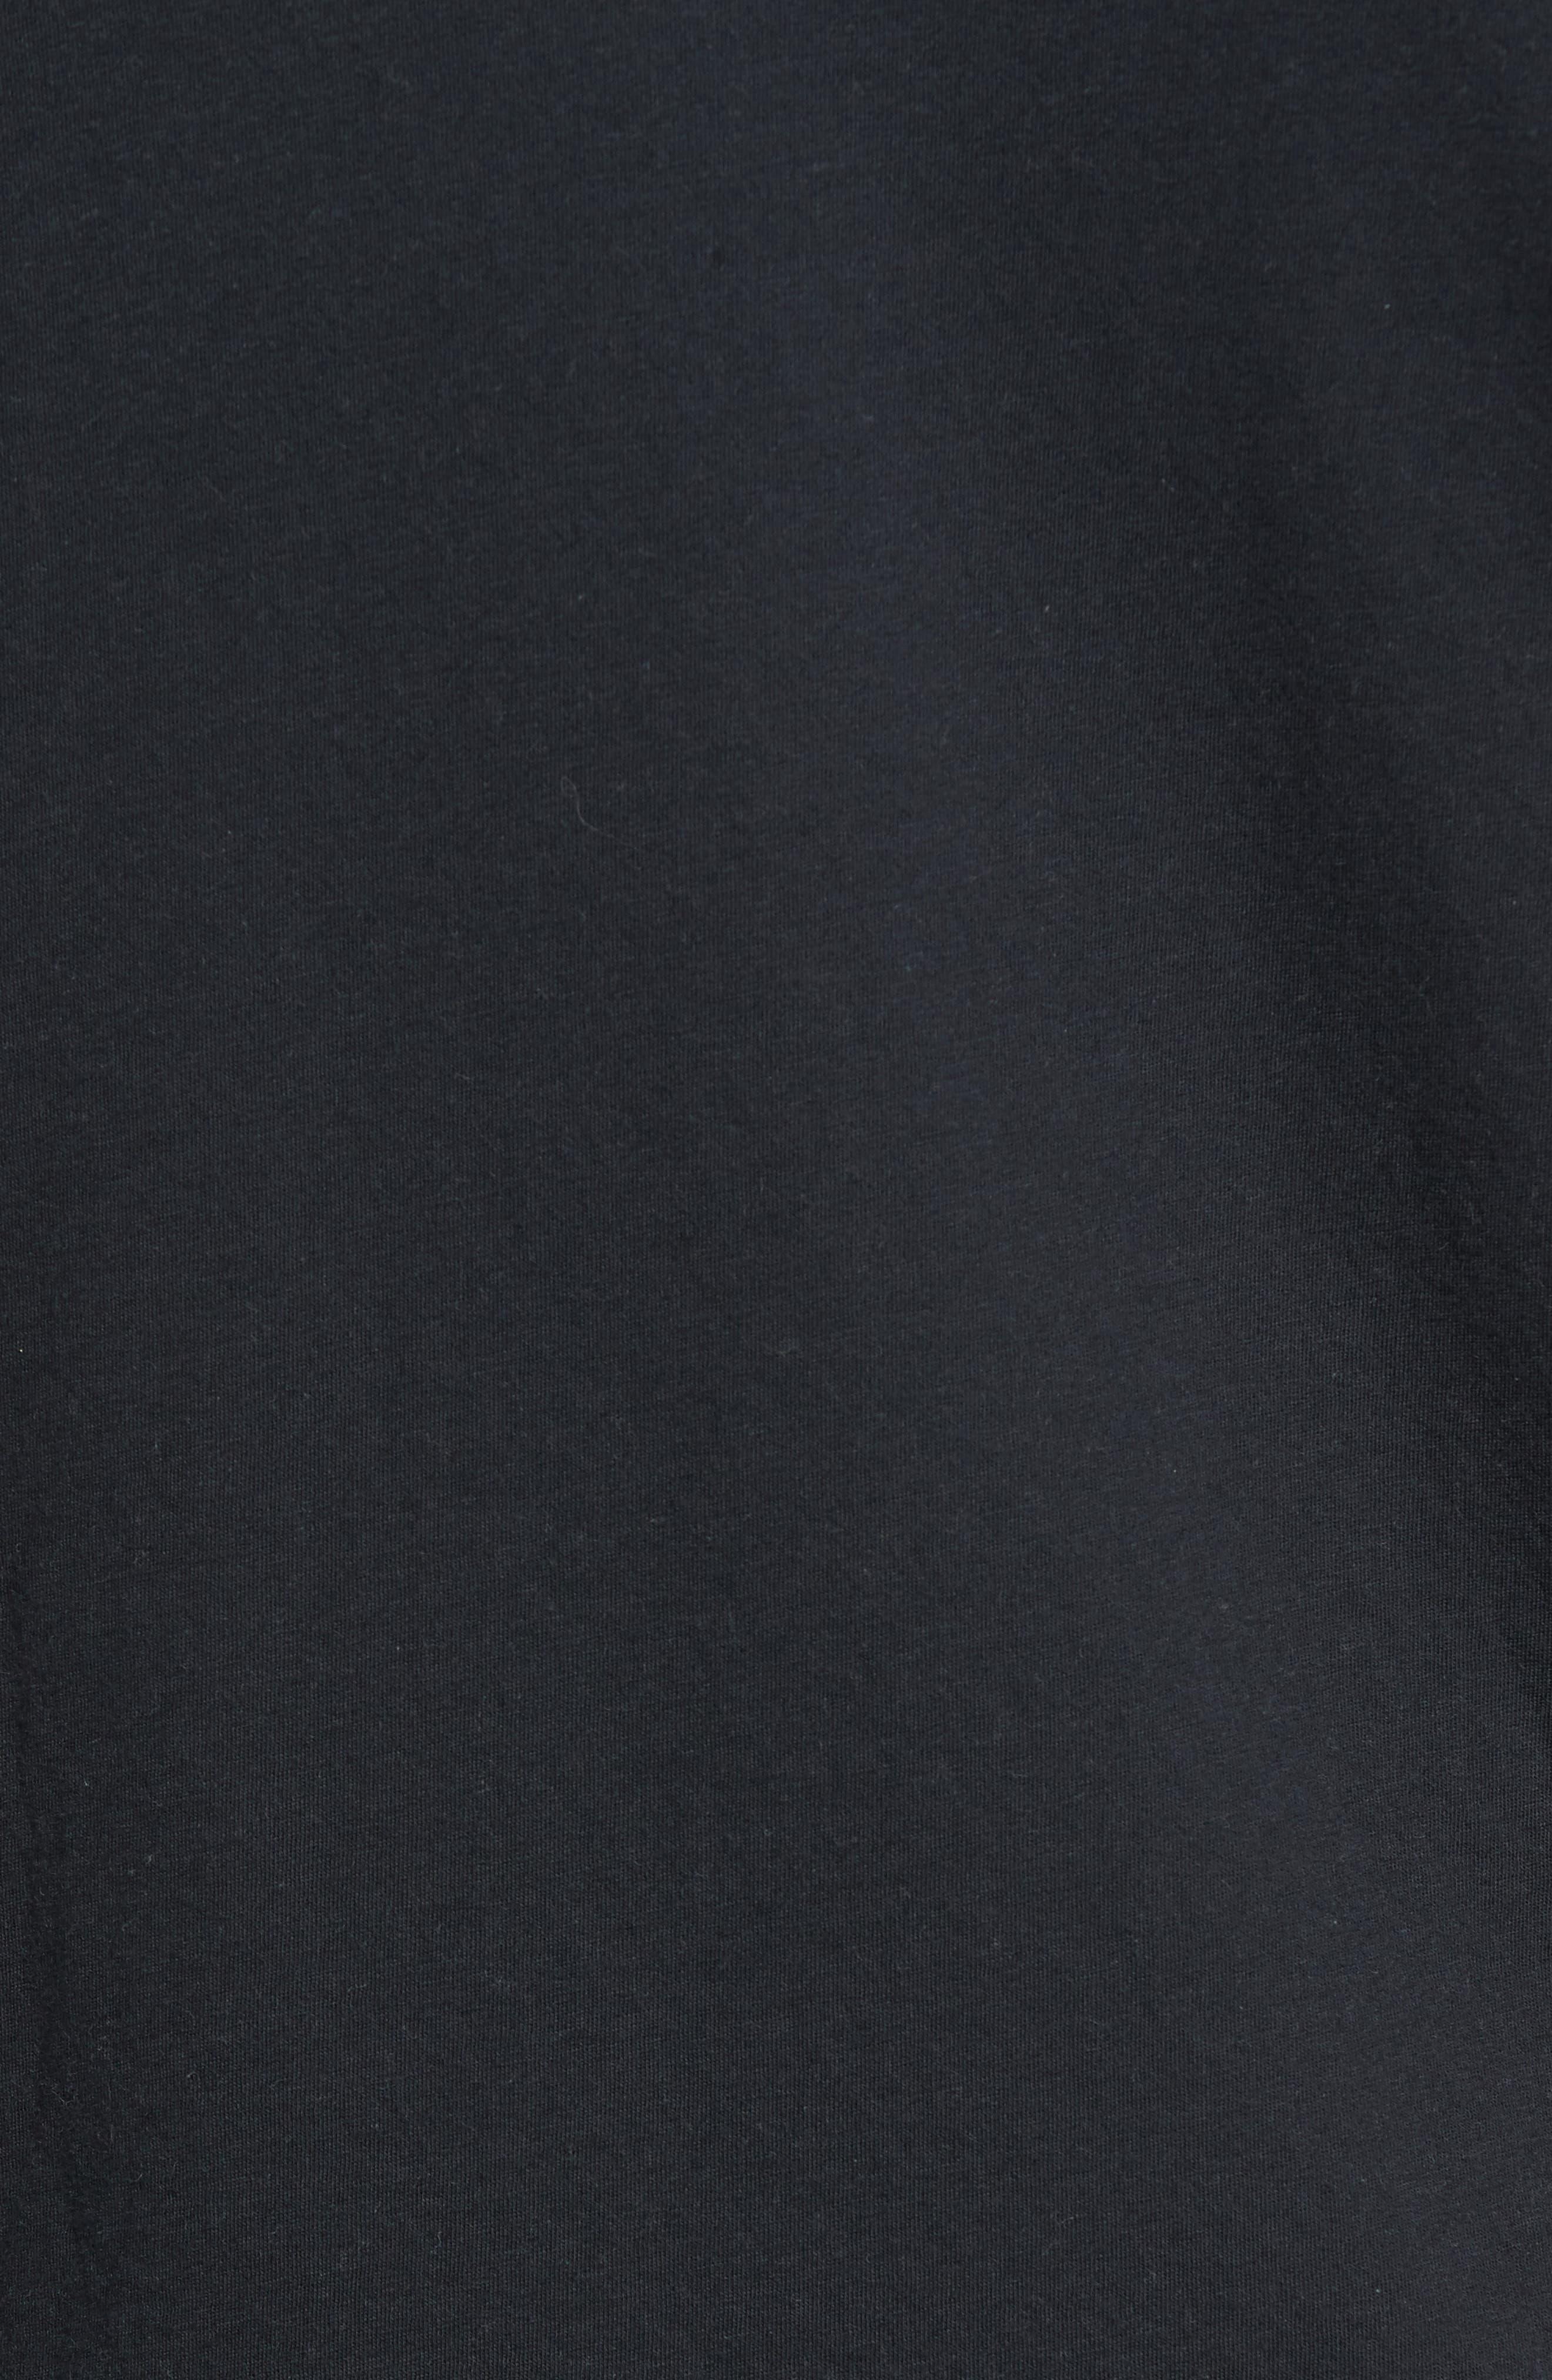 NIKE, Tech Regular Fit Fleece Hoodie, Alternate thumbnail 6, color, BLACK/ CARBON HEATHER